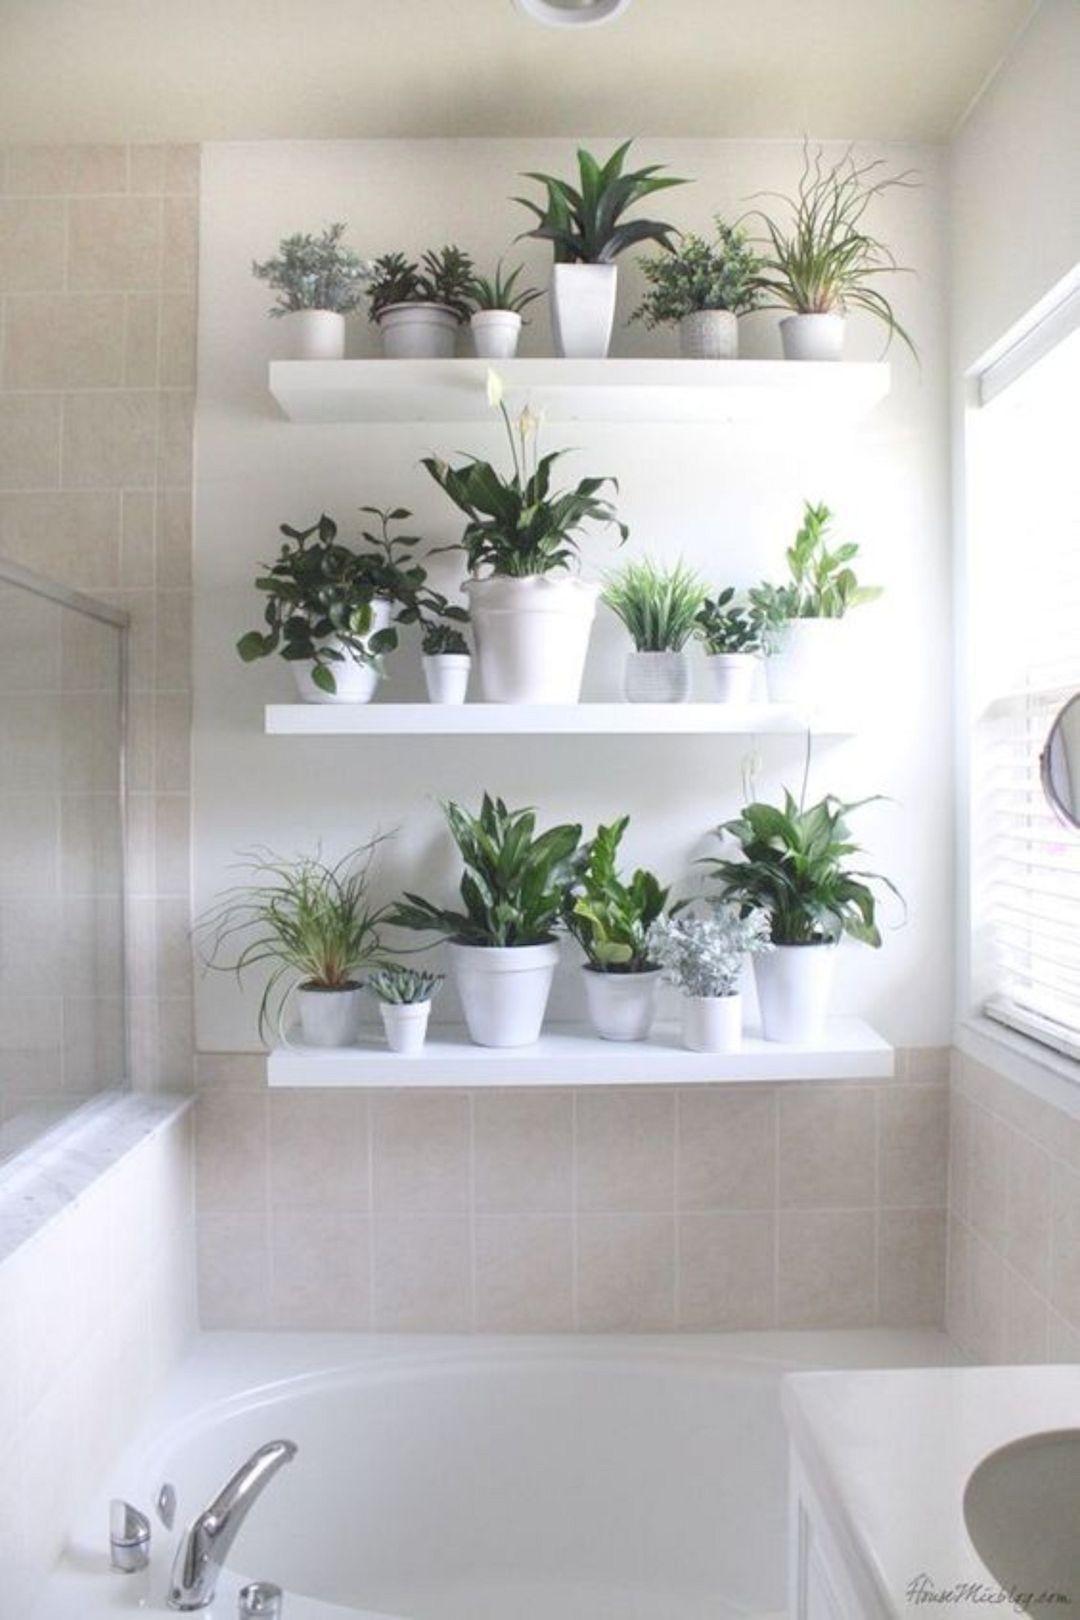 5 Mesmerizing Home Decor Ideas For Dining Room Ikea Lack Shelves Plant Wall Lack Shelf